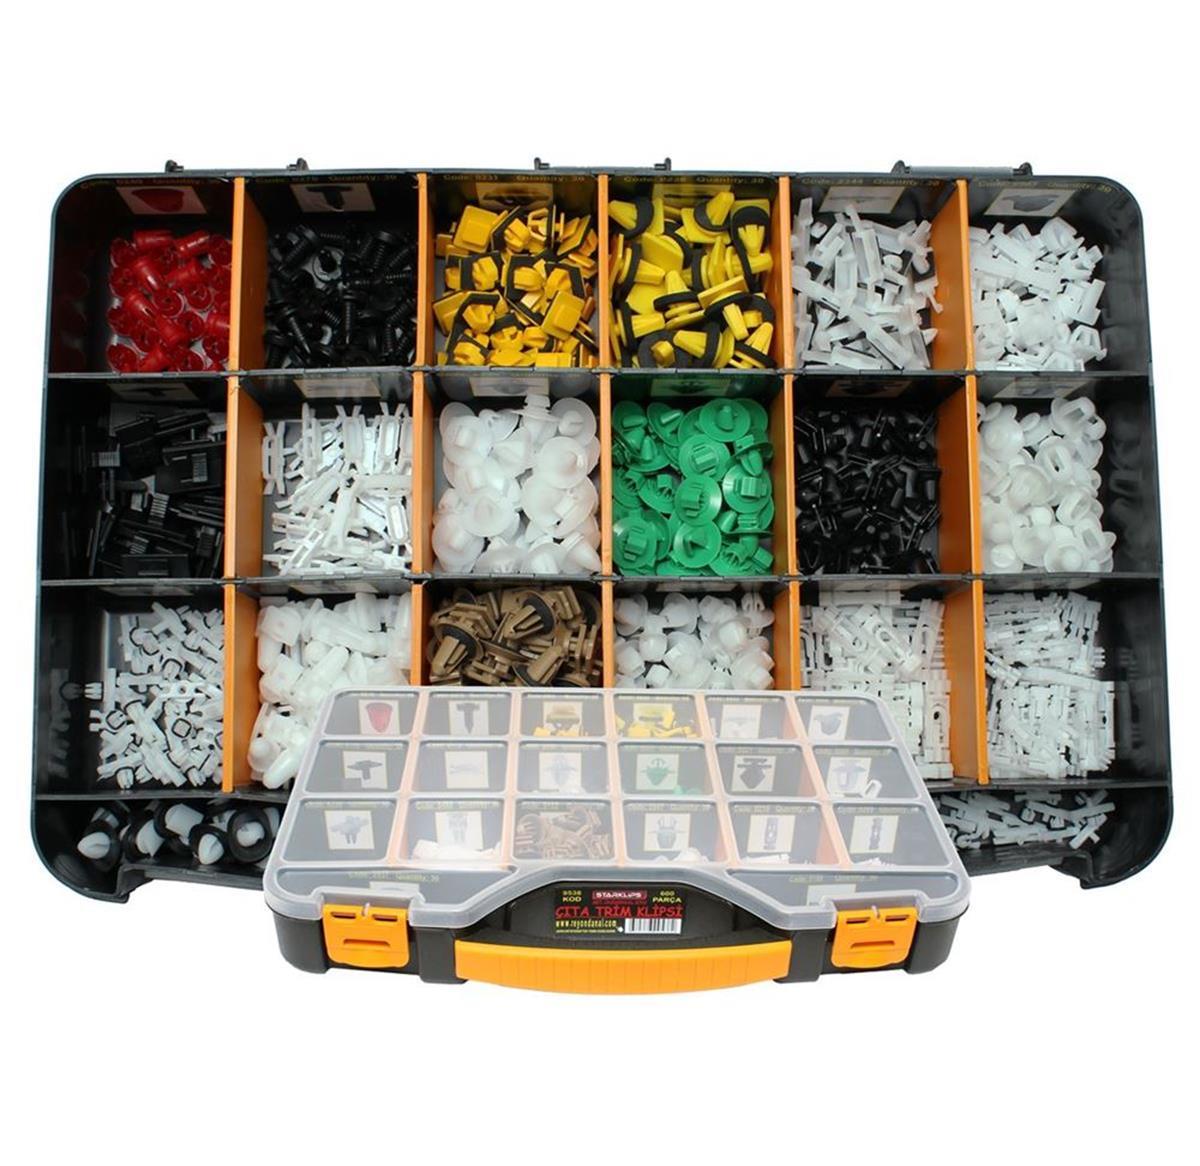 Slat قصاصات قصاصات مجموعة الحقائب 600 قطعة عالمي + قفل السيارة ل-دفع دبوس-برشام تقليم